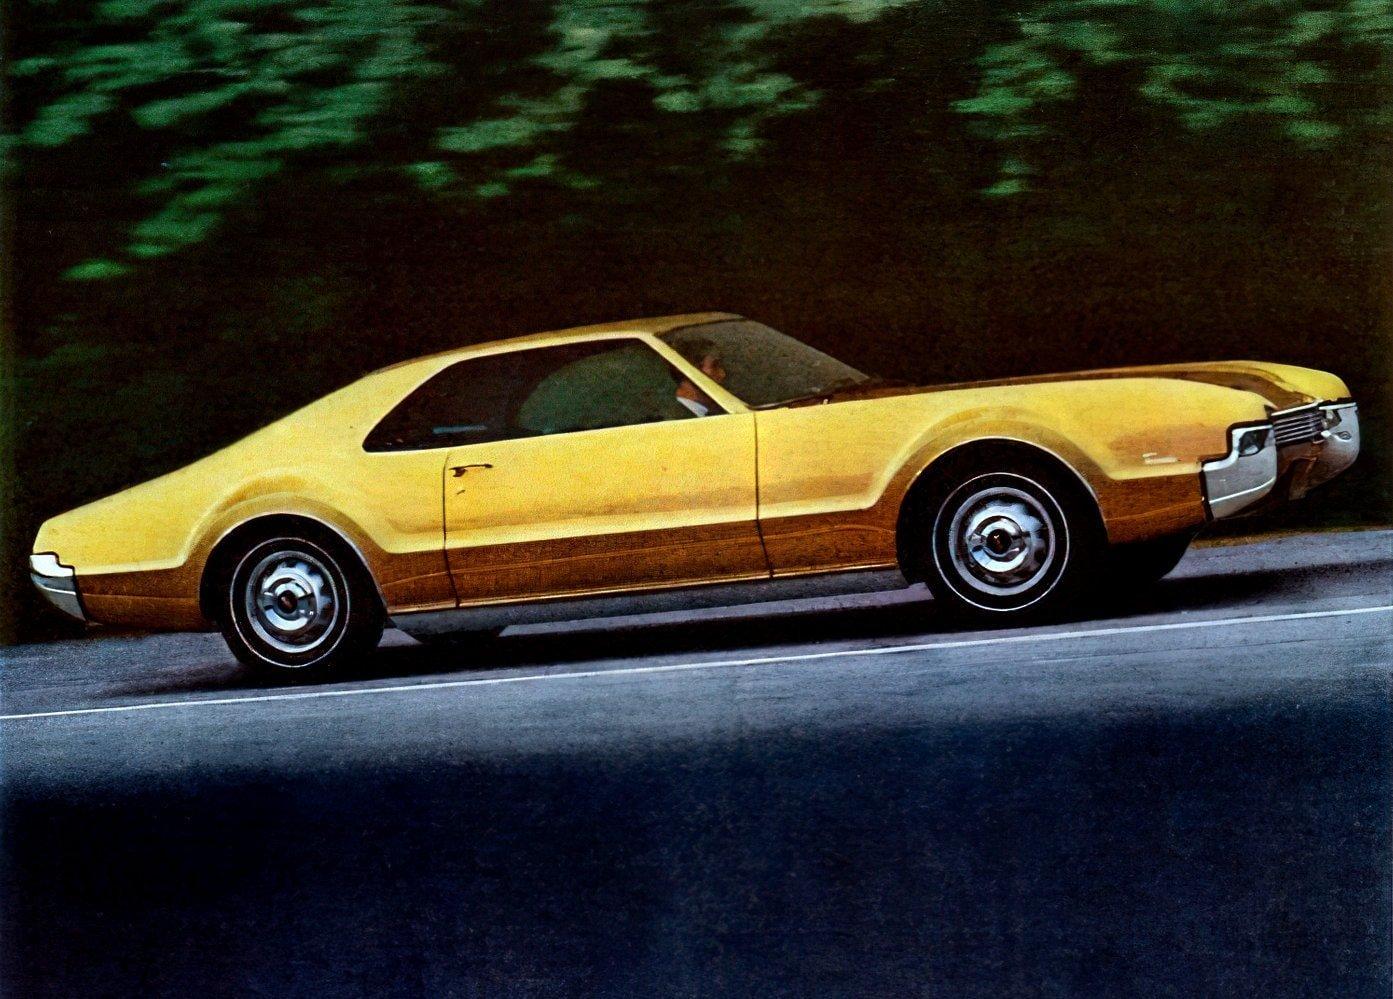 Classic '60s Oldsmobile Toronados were 'rocket action' cars